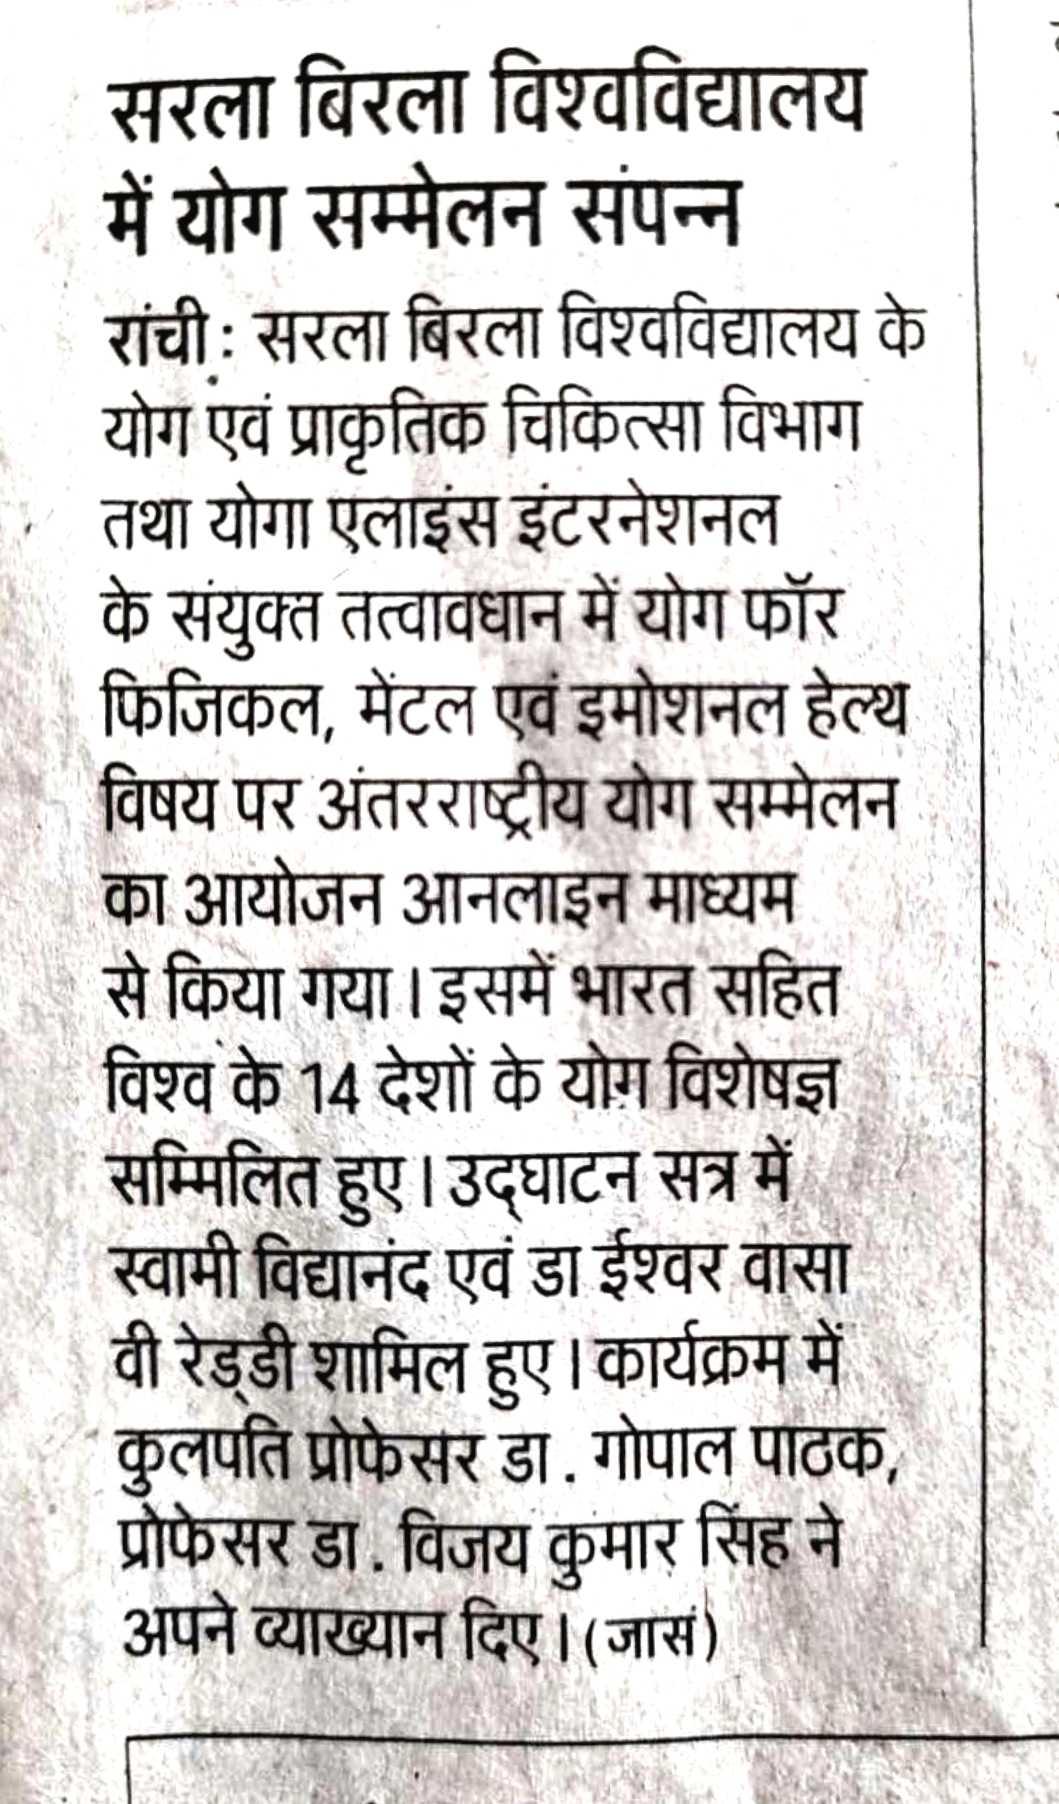 Dainik Jagran-Ranchi 6/26/2021 12:00:00 AM